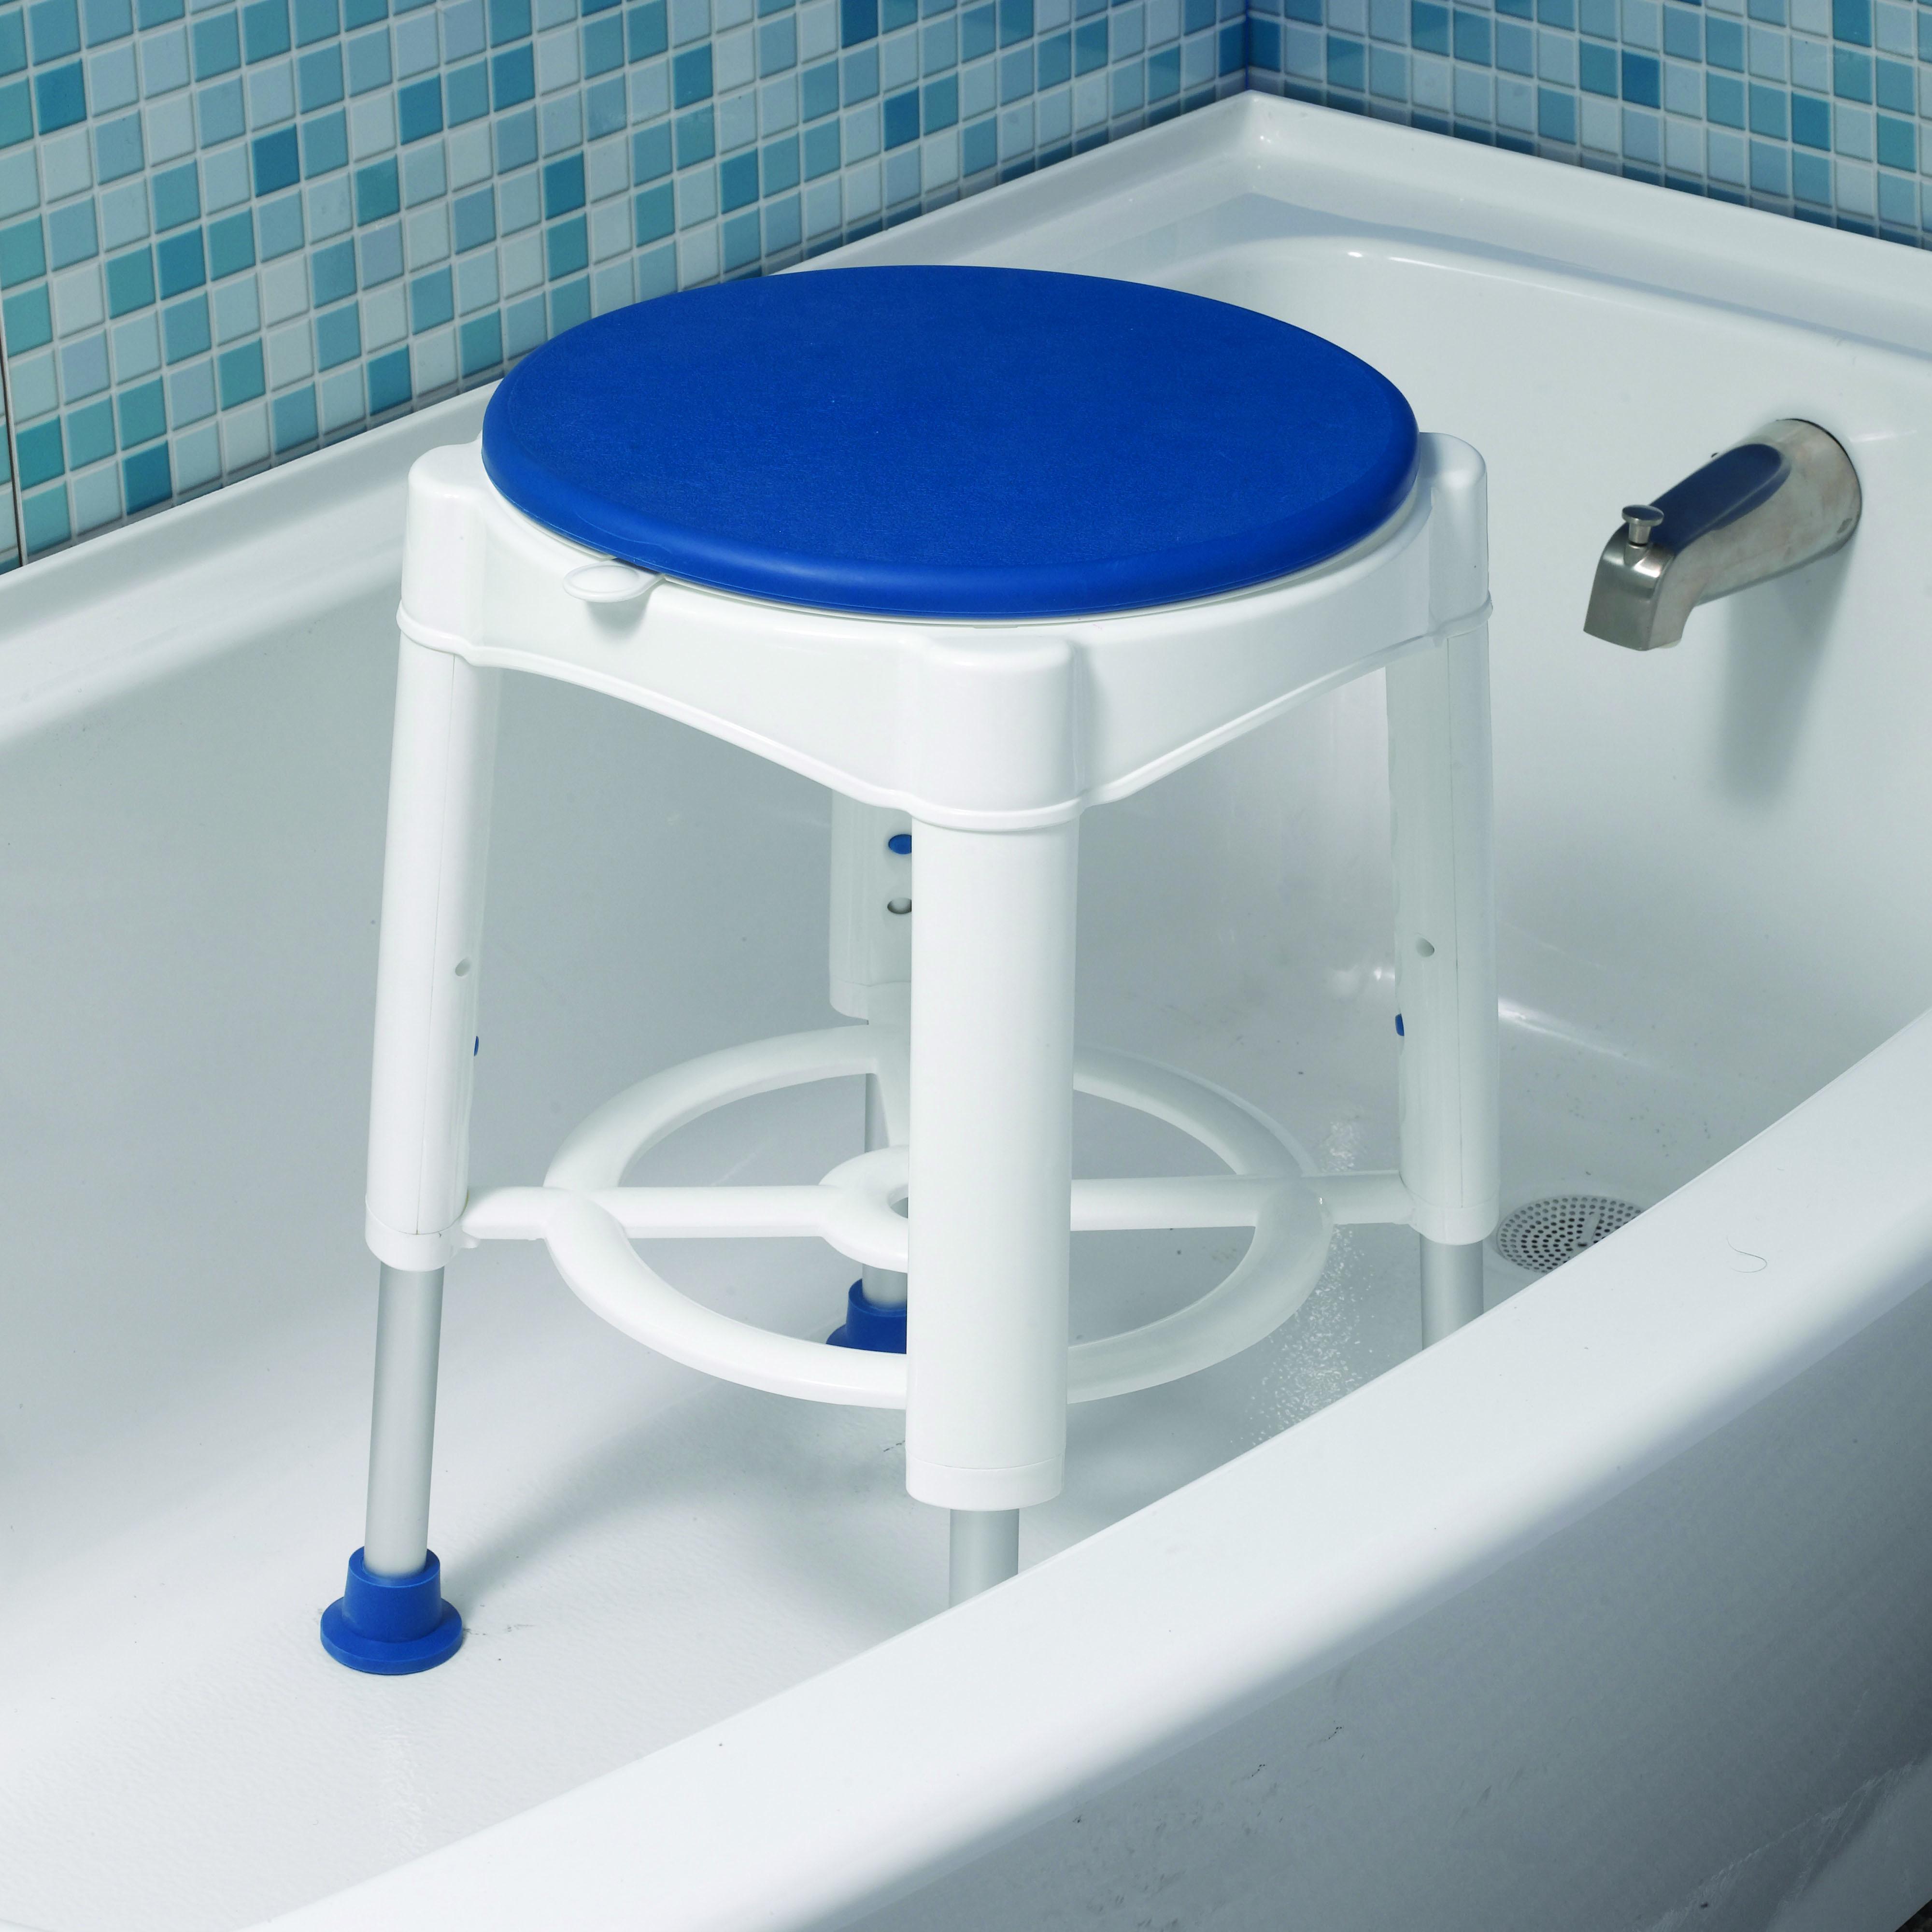 Bathroom Safety Swivel Seat Shower Stool – AMS